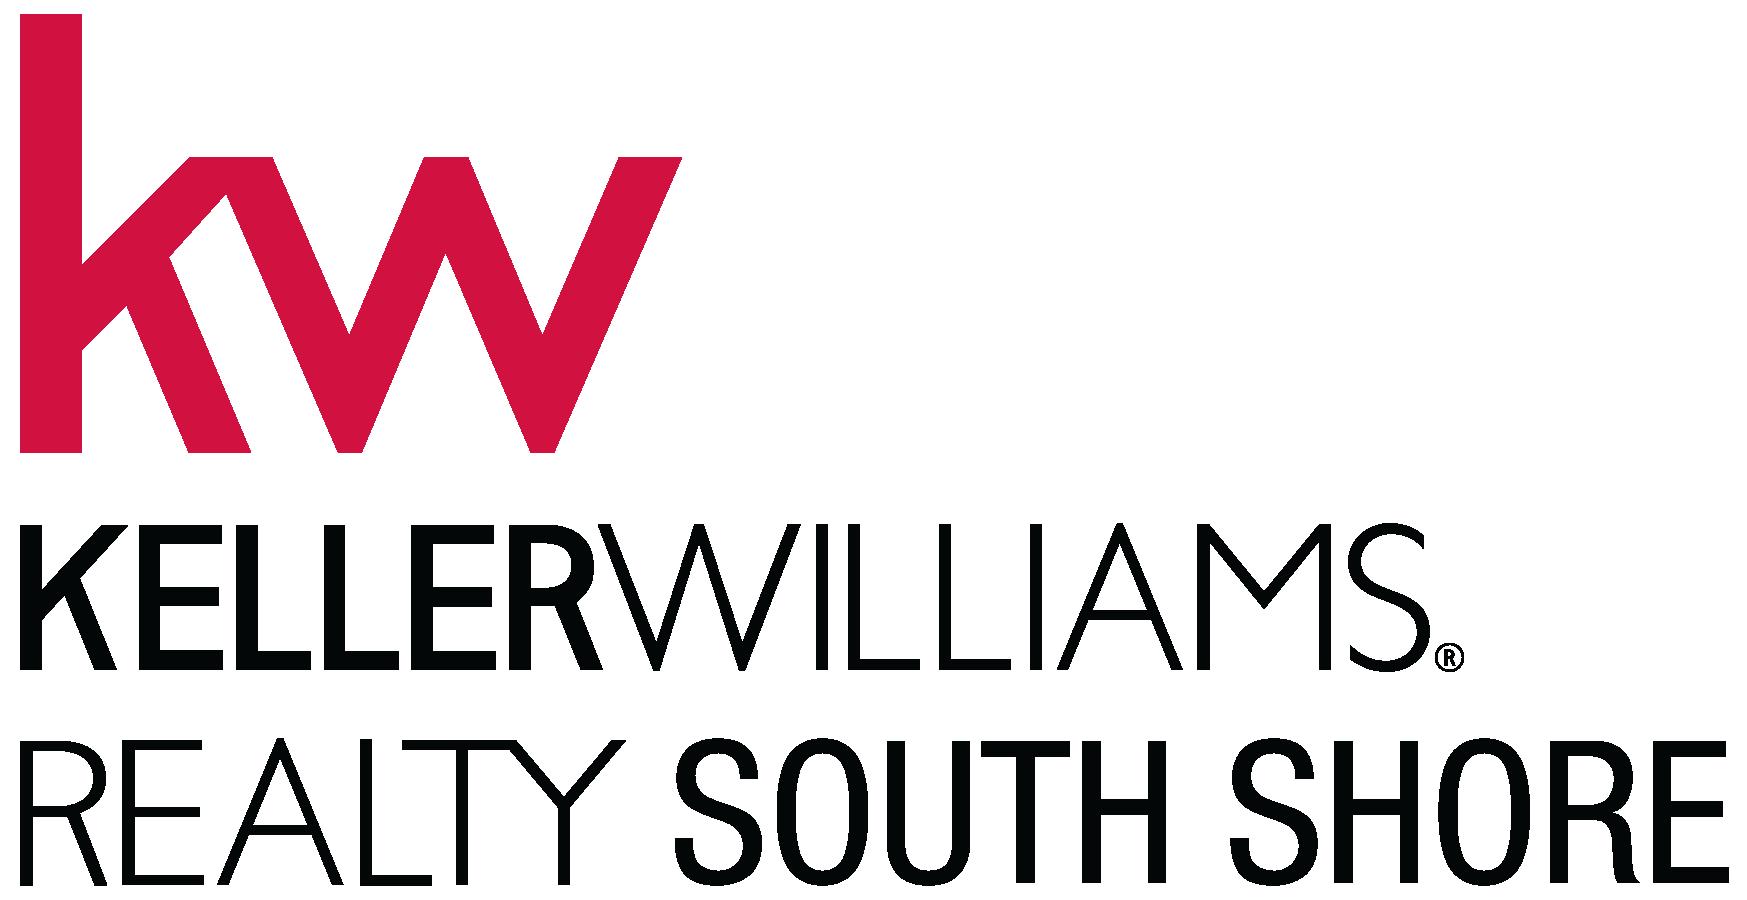 Keller Williams Realty South Shore